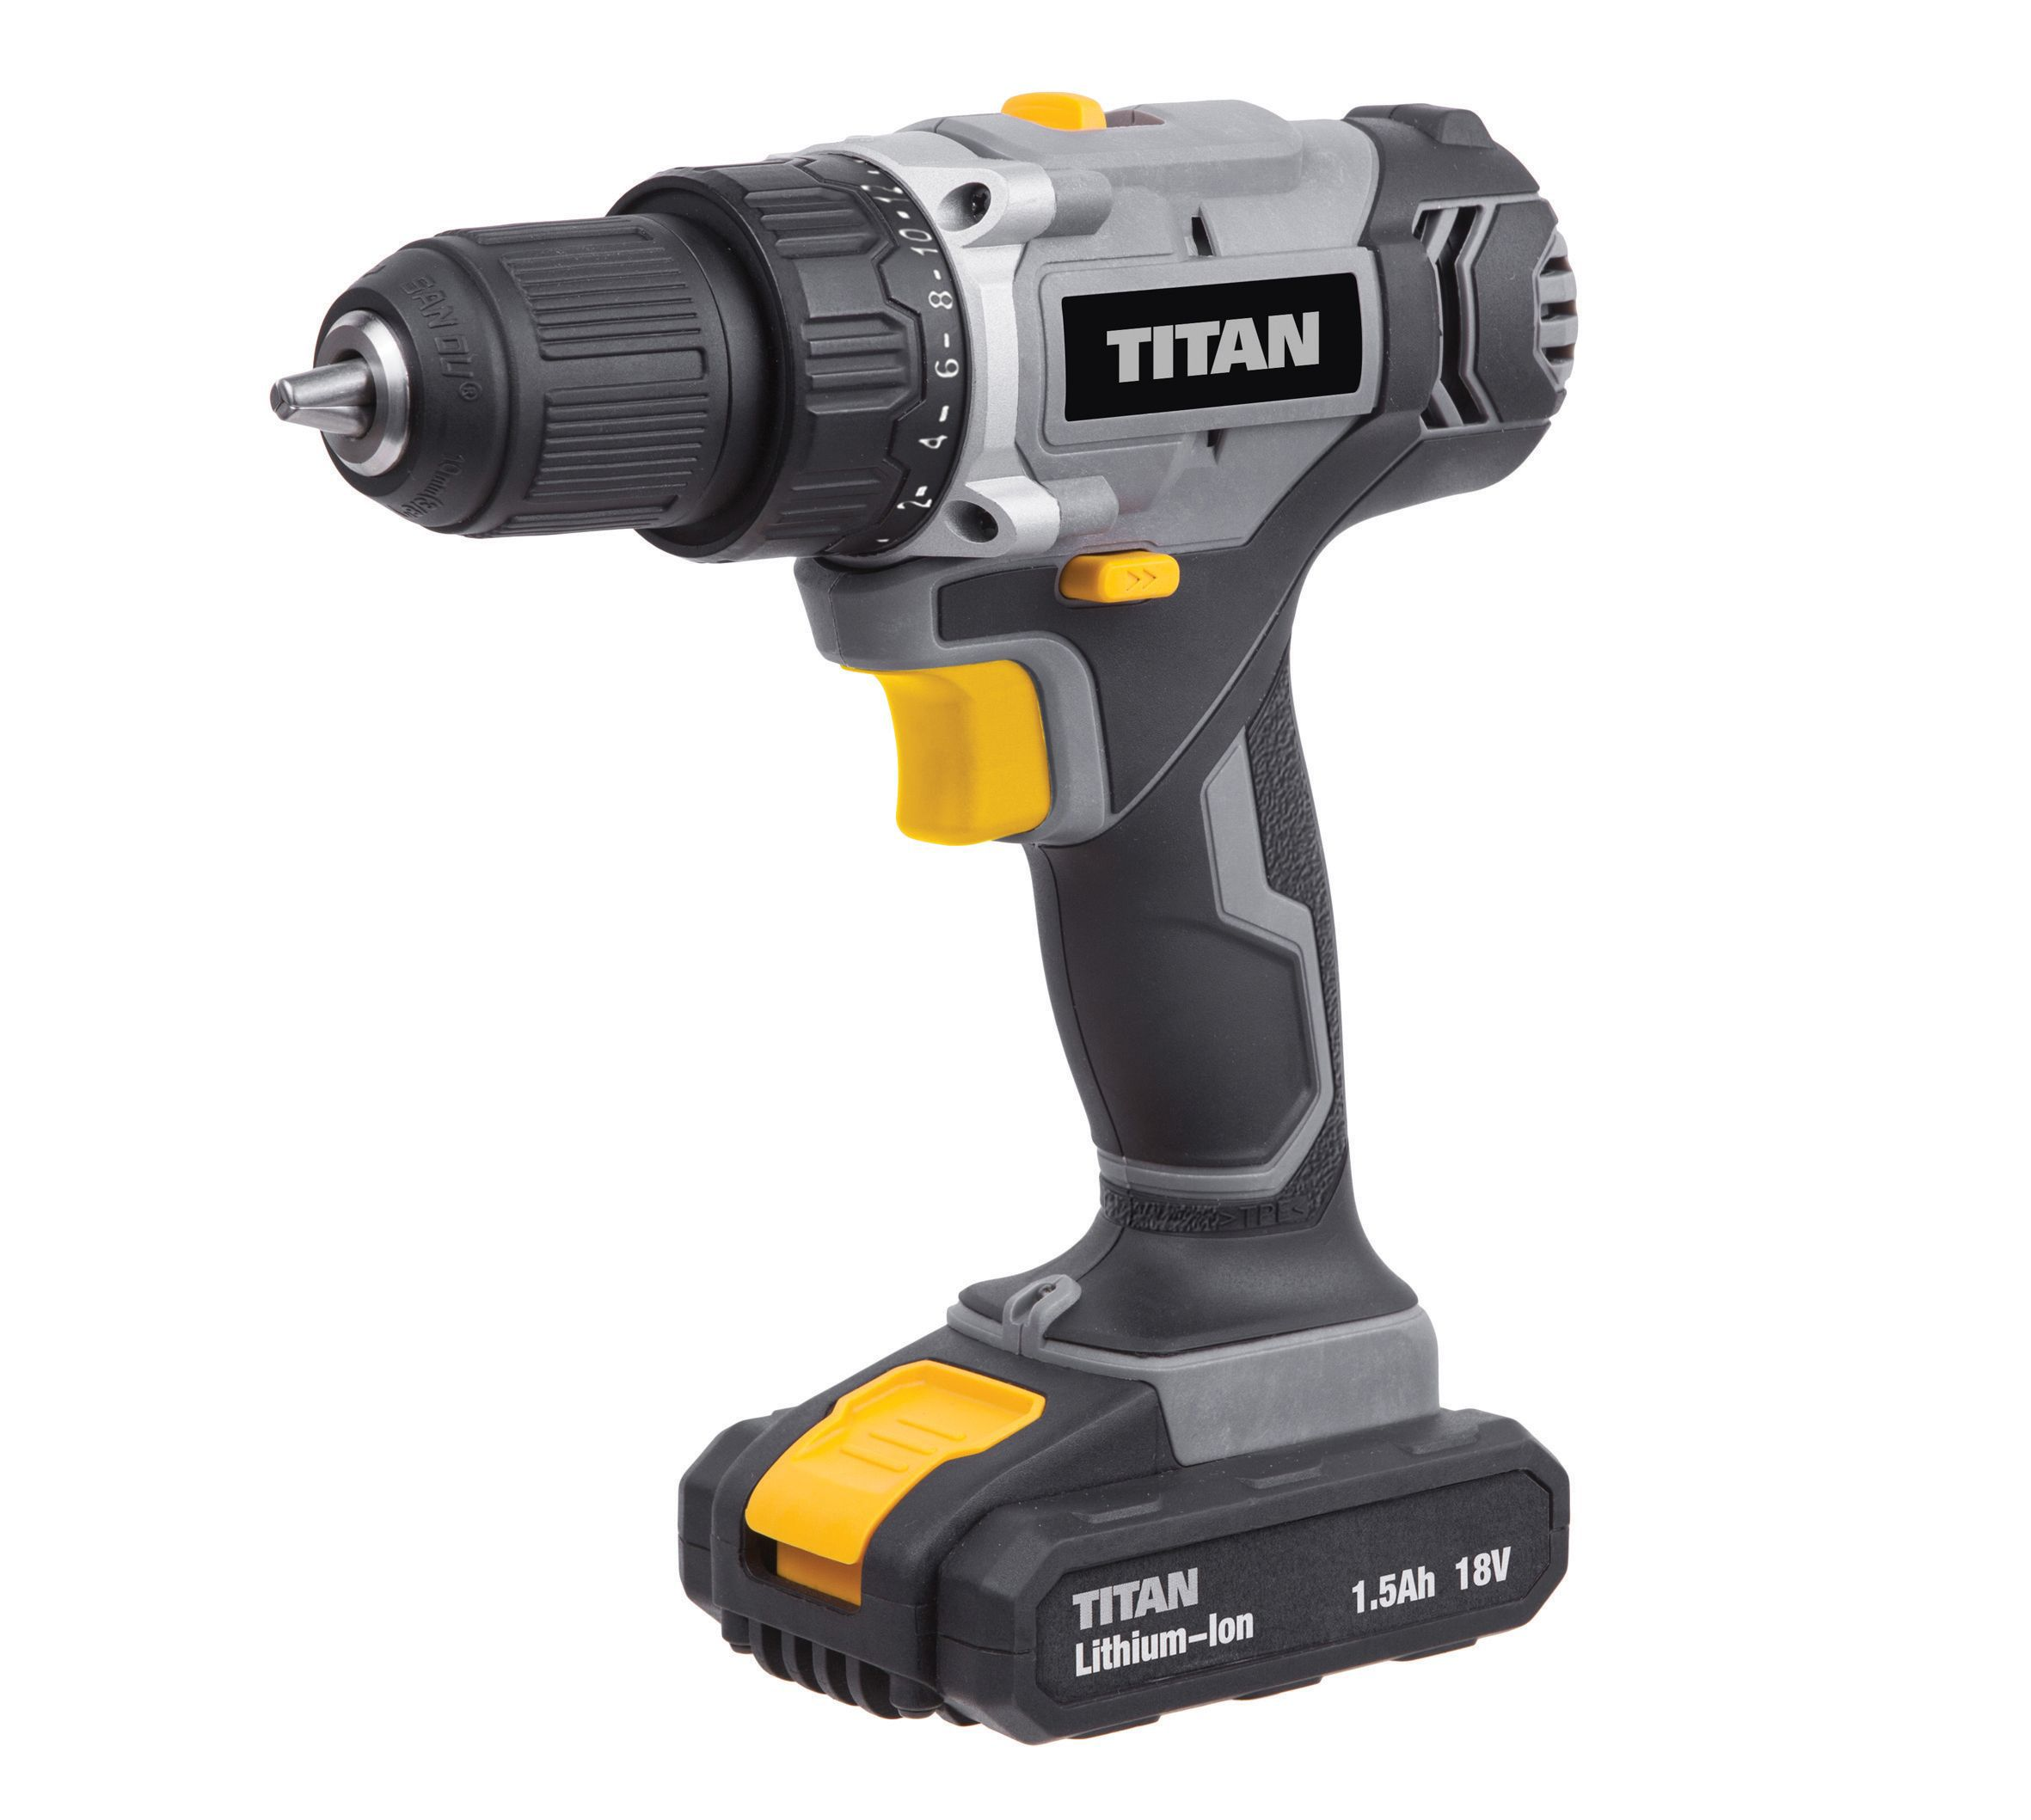 Titan Cordless 18v Li Ion Cordless Drill Driver 2